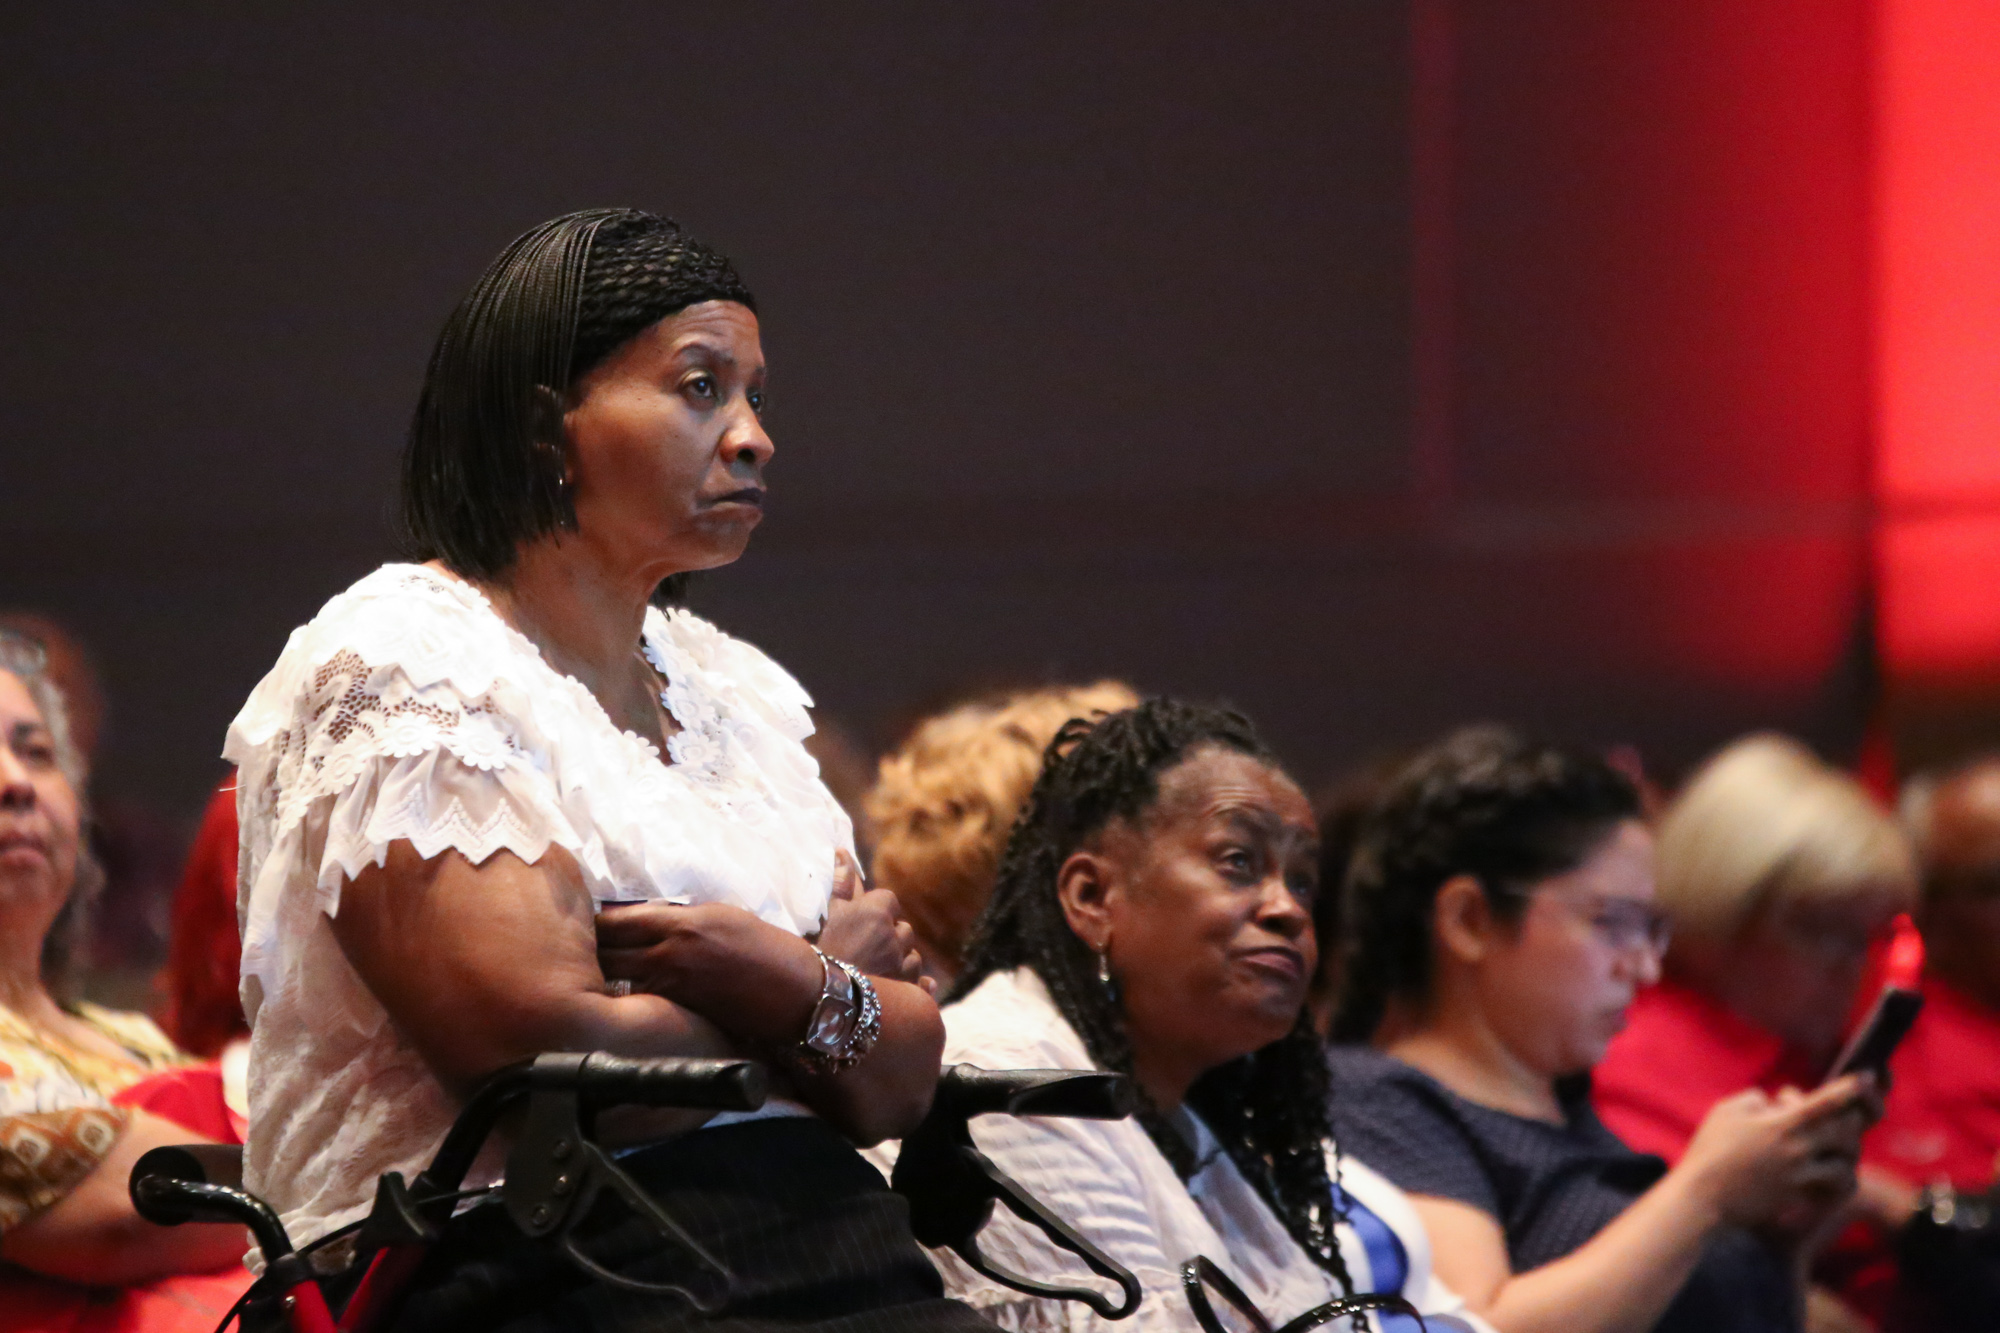 Community members listen intently during the AARP Debate. (Photo Credit:  GA Media Productions )